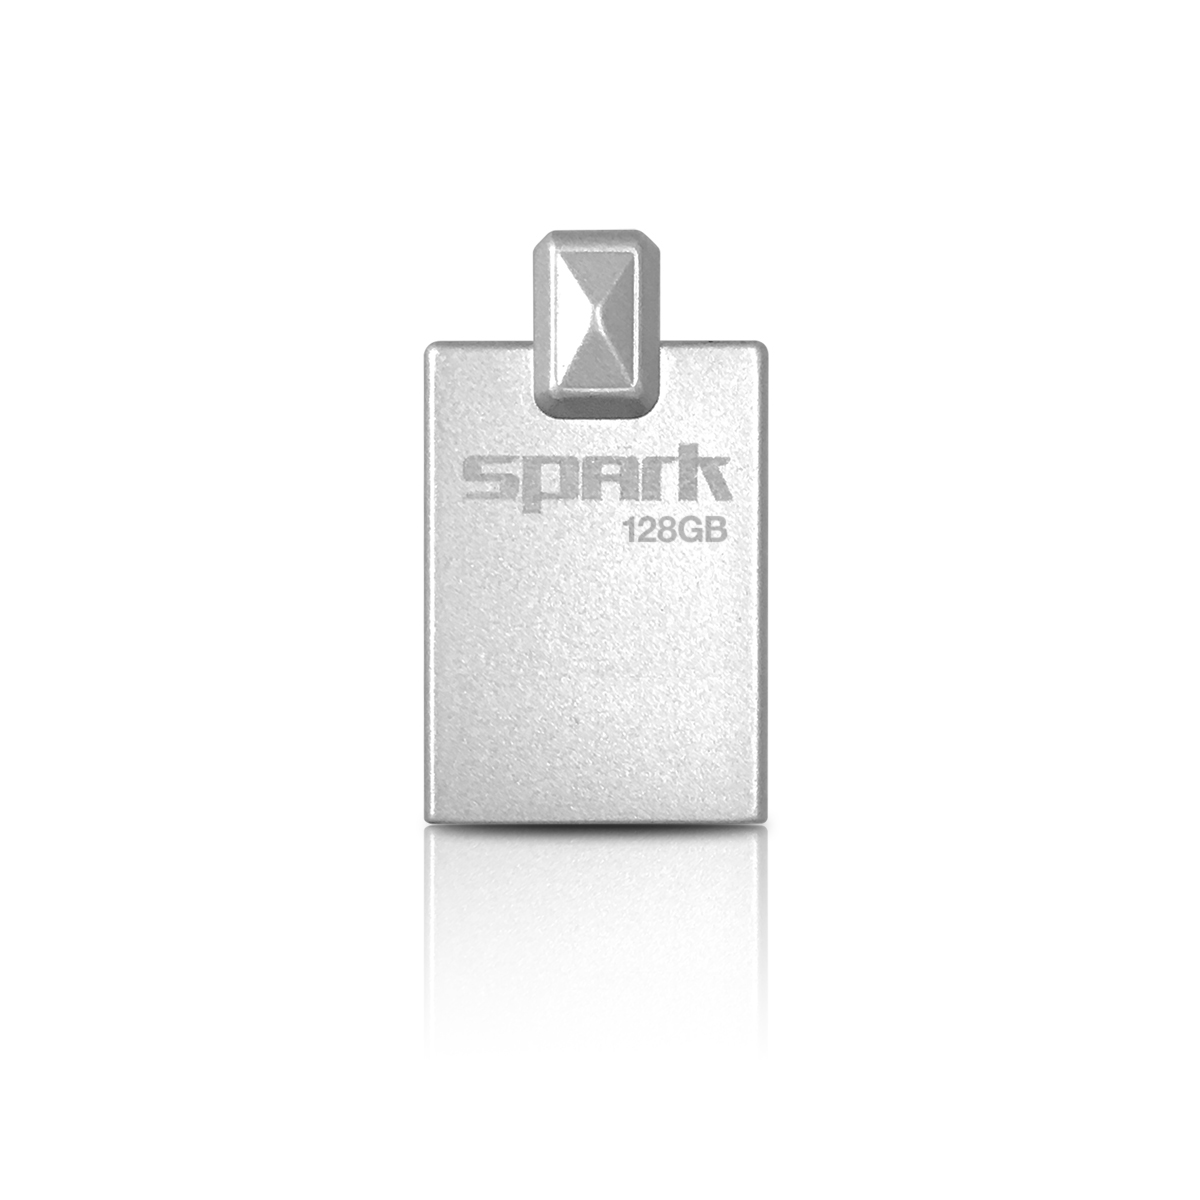 128B Patriot Spark USB 3.1 110/20MBs